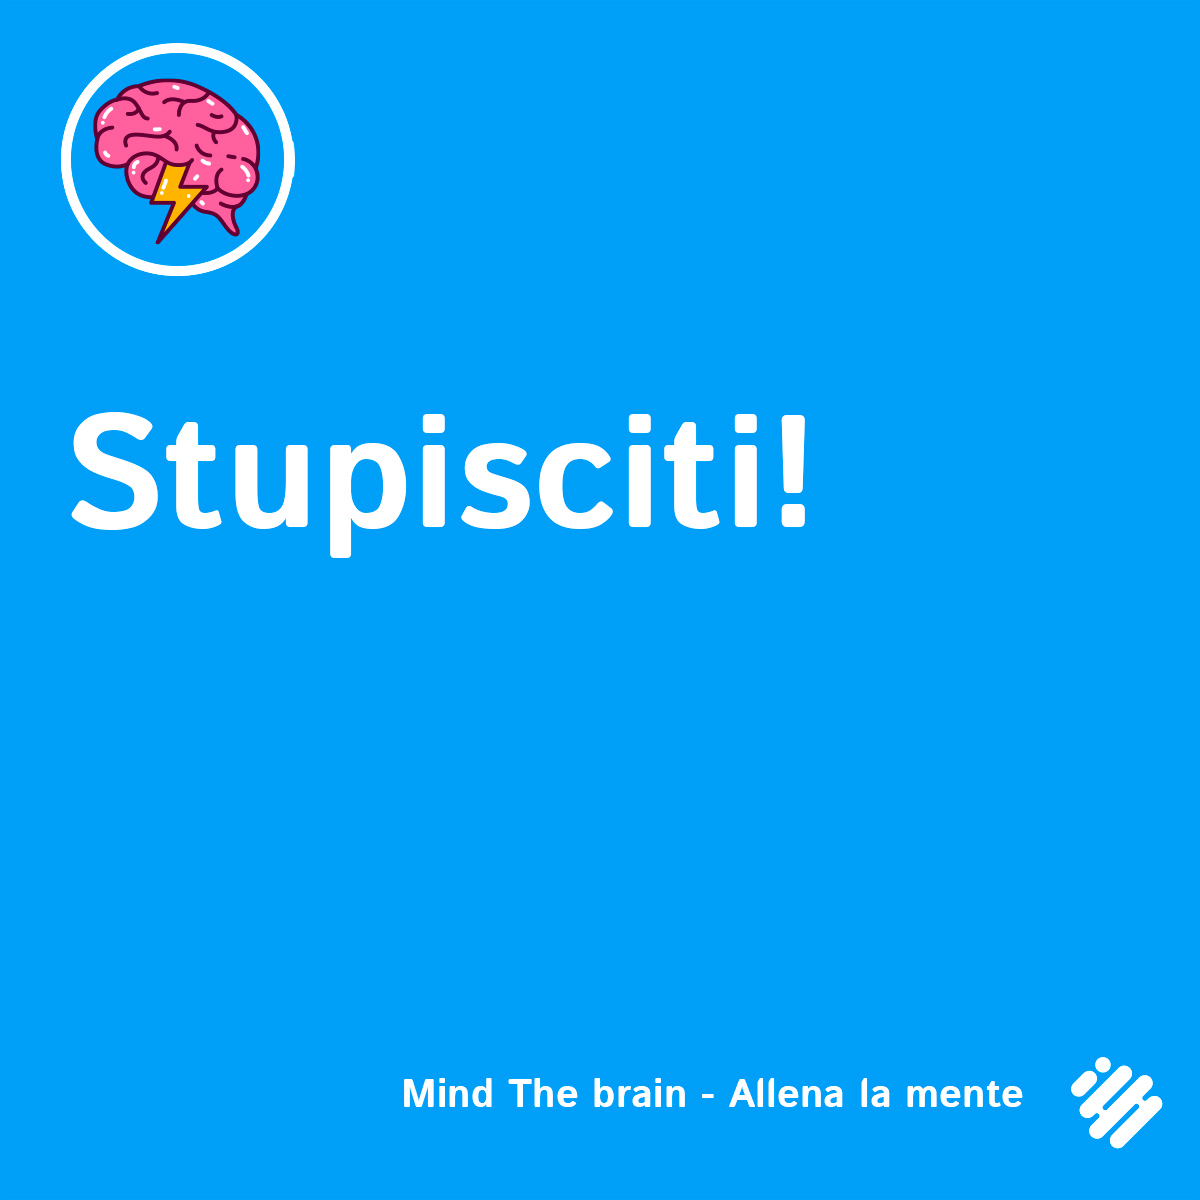 Stupisciti